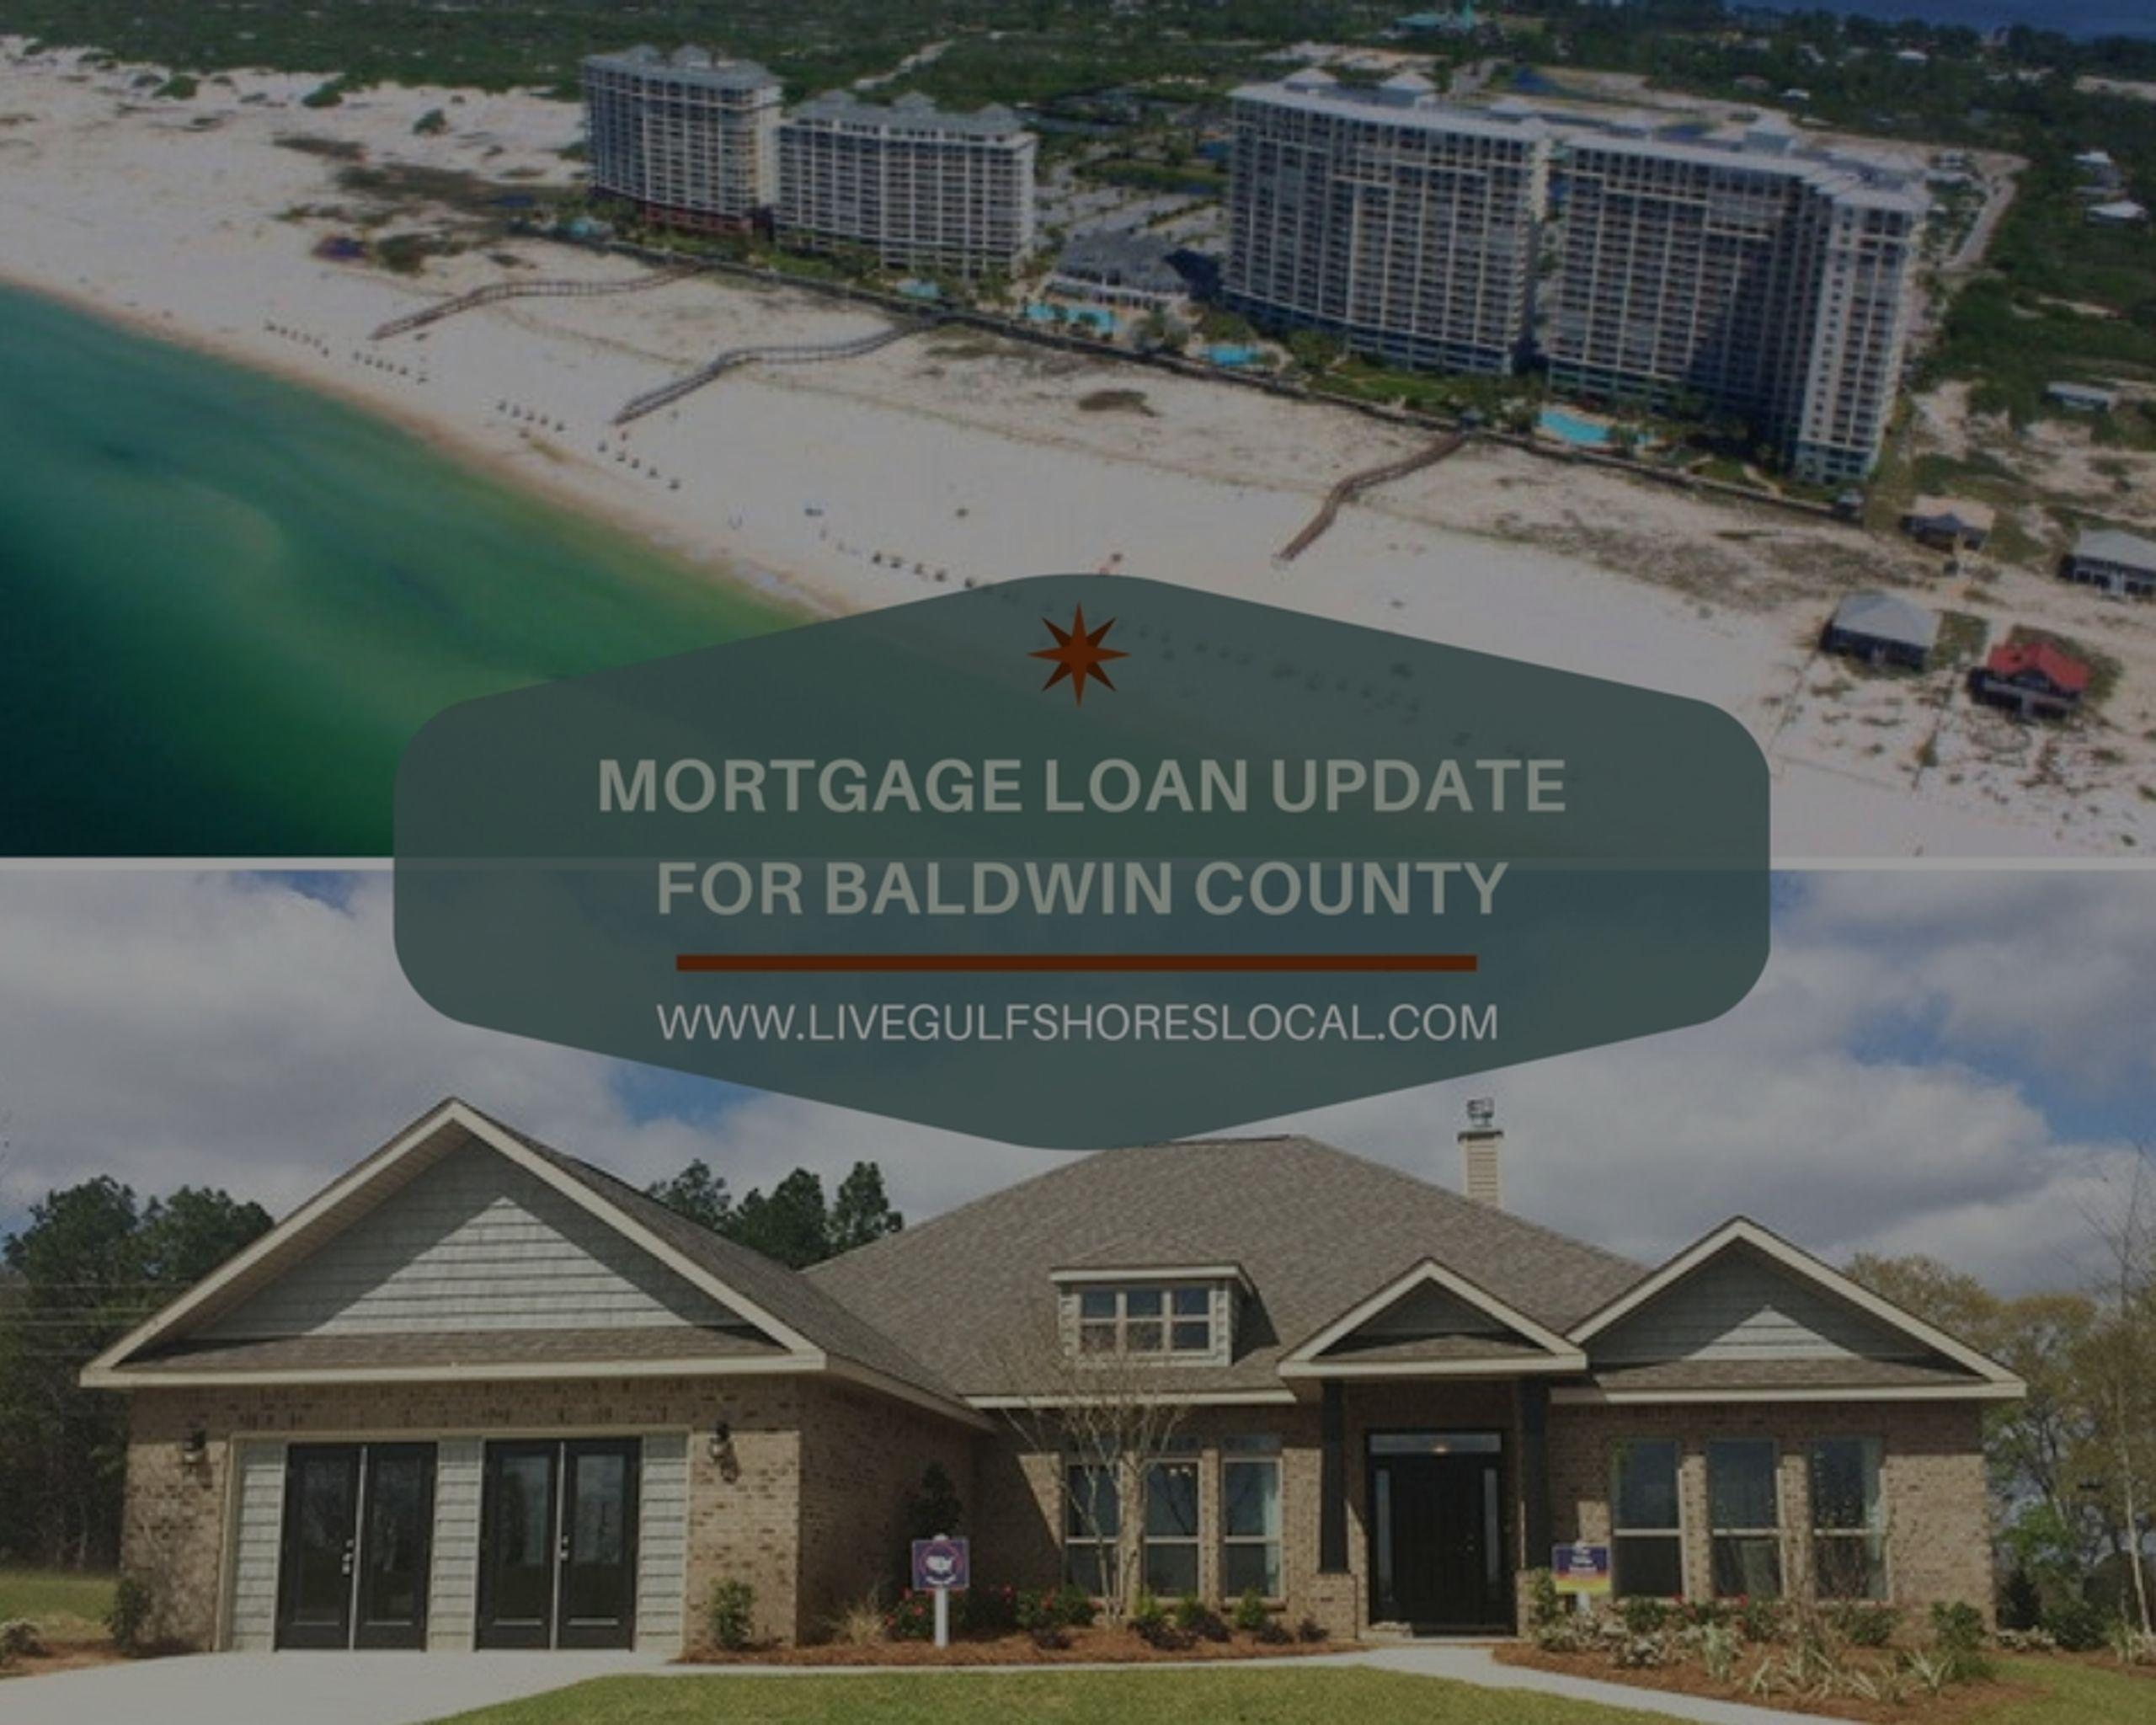 Mortgage Loan Update for Baldwin County – 1/17/19